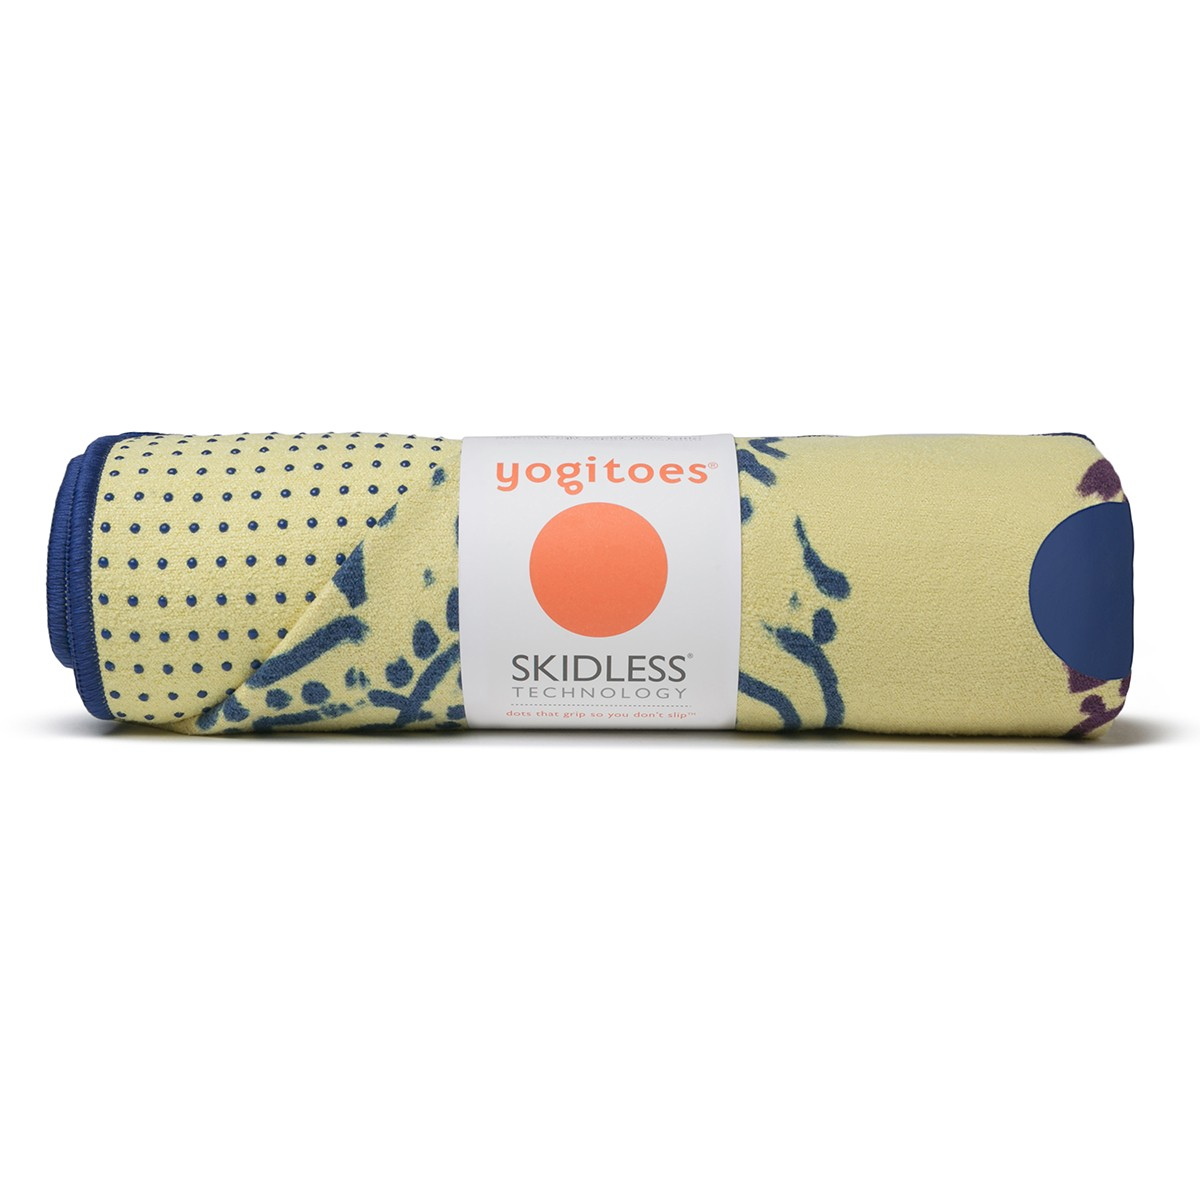 Yogitoes Skidless Yoga Towel